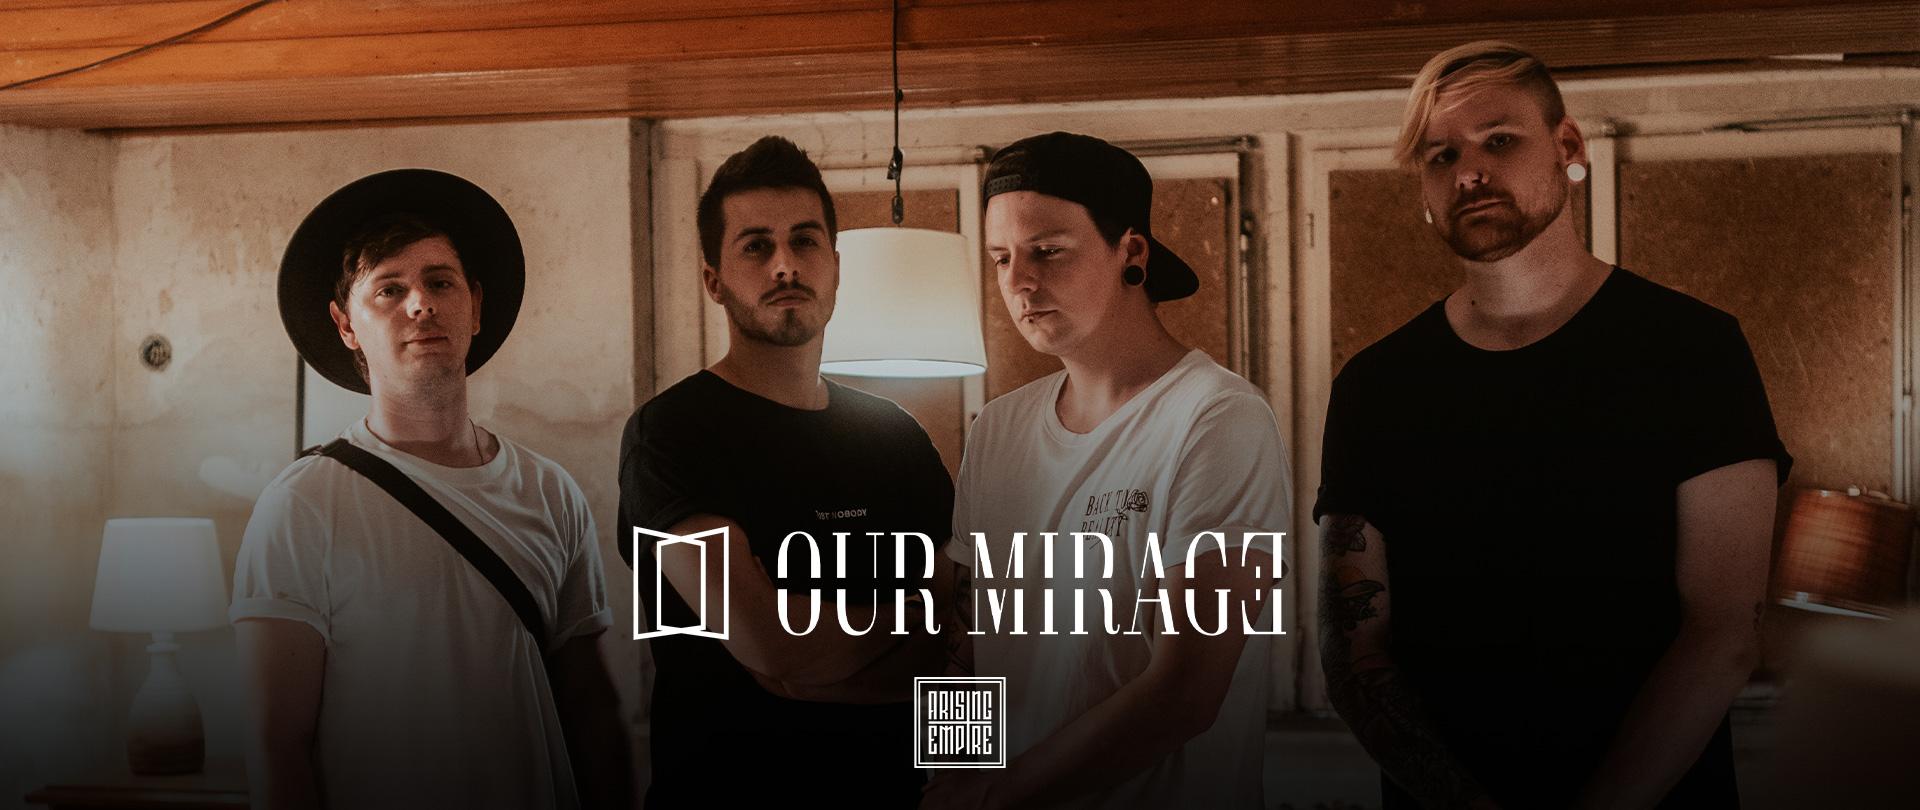 Our Mirage at Arising Empire • Official Online Shop / EN